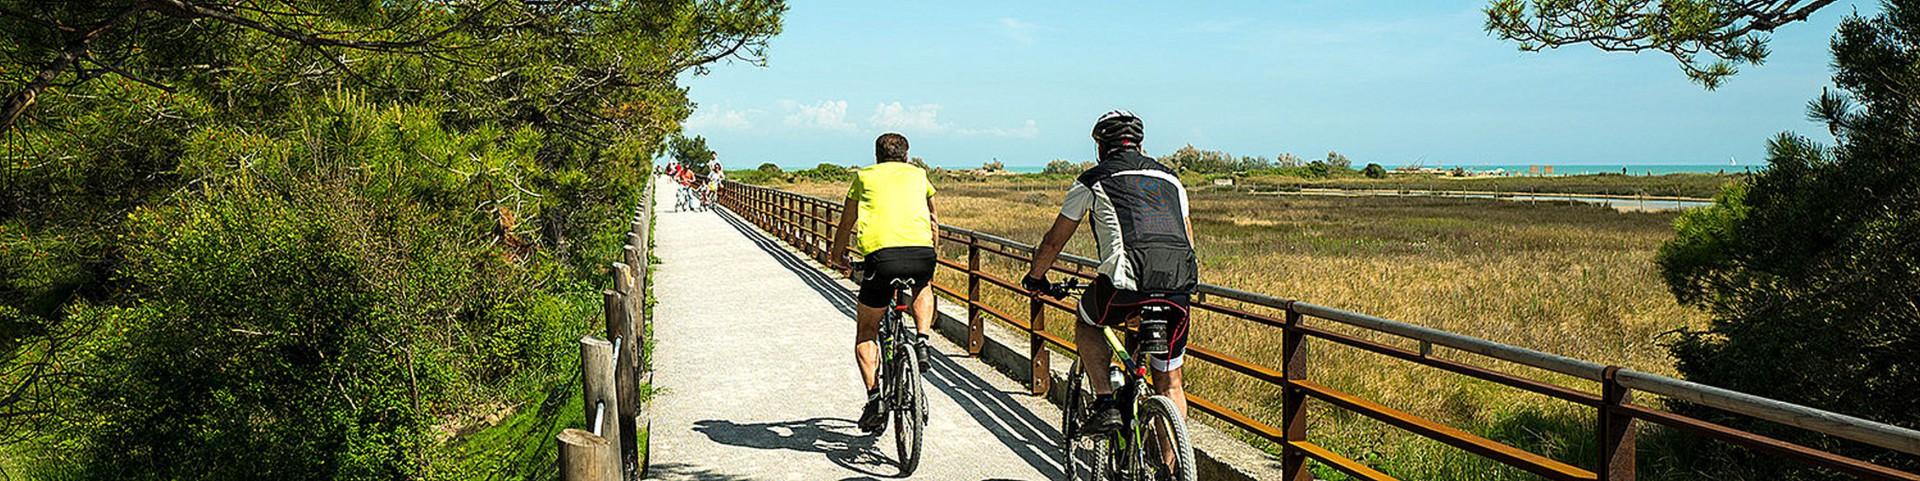 V Bibione najdete kilometry cyklostezek